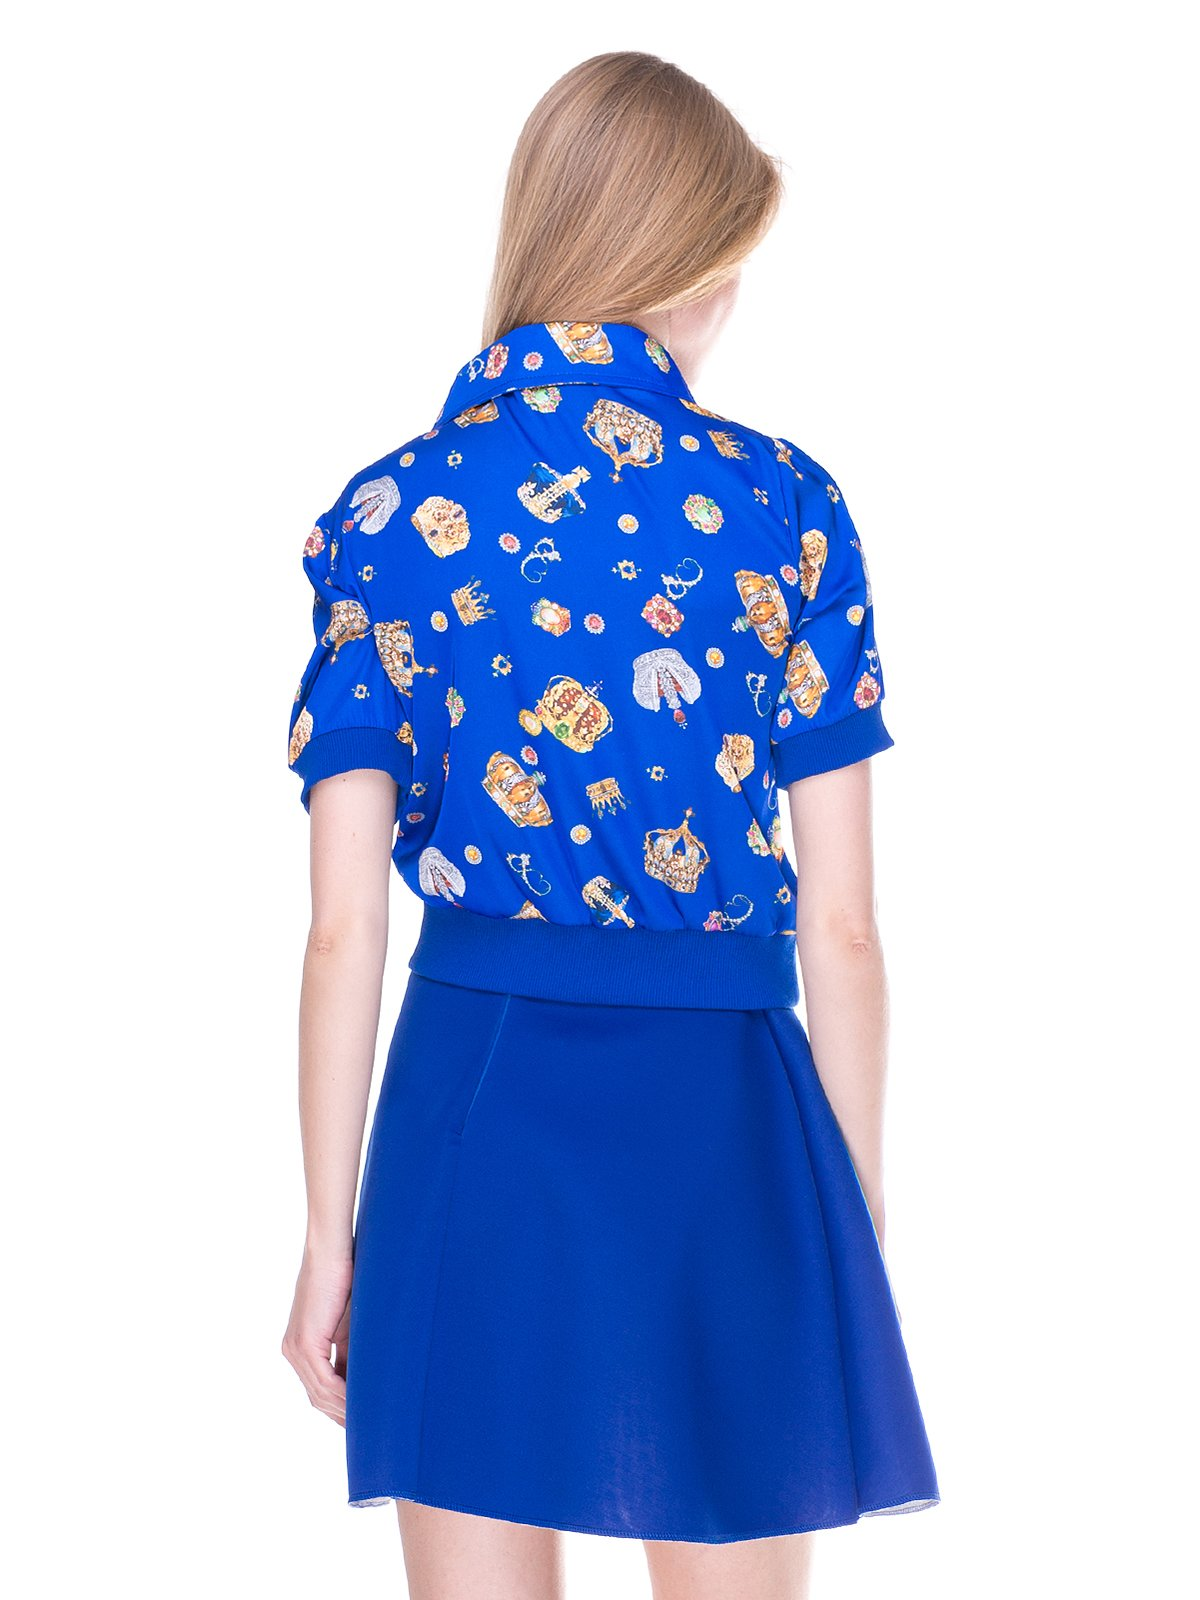 Блуза синя з принтом | 2273971 | фото 2